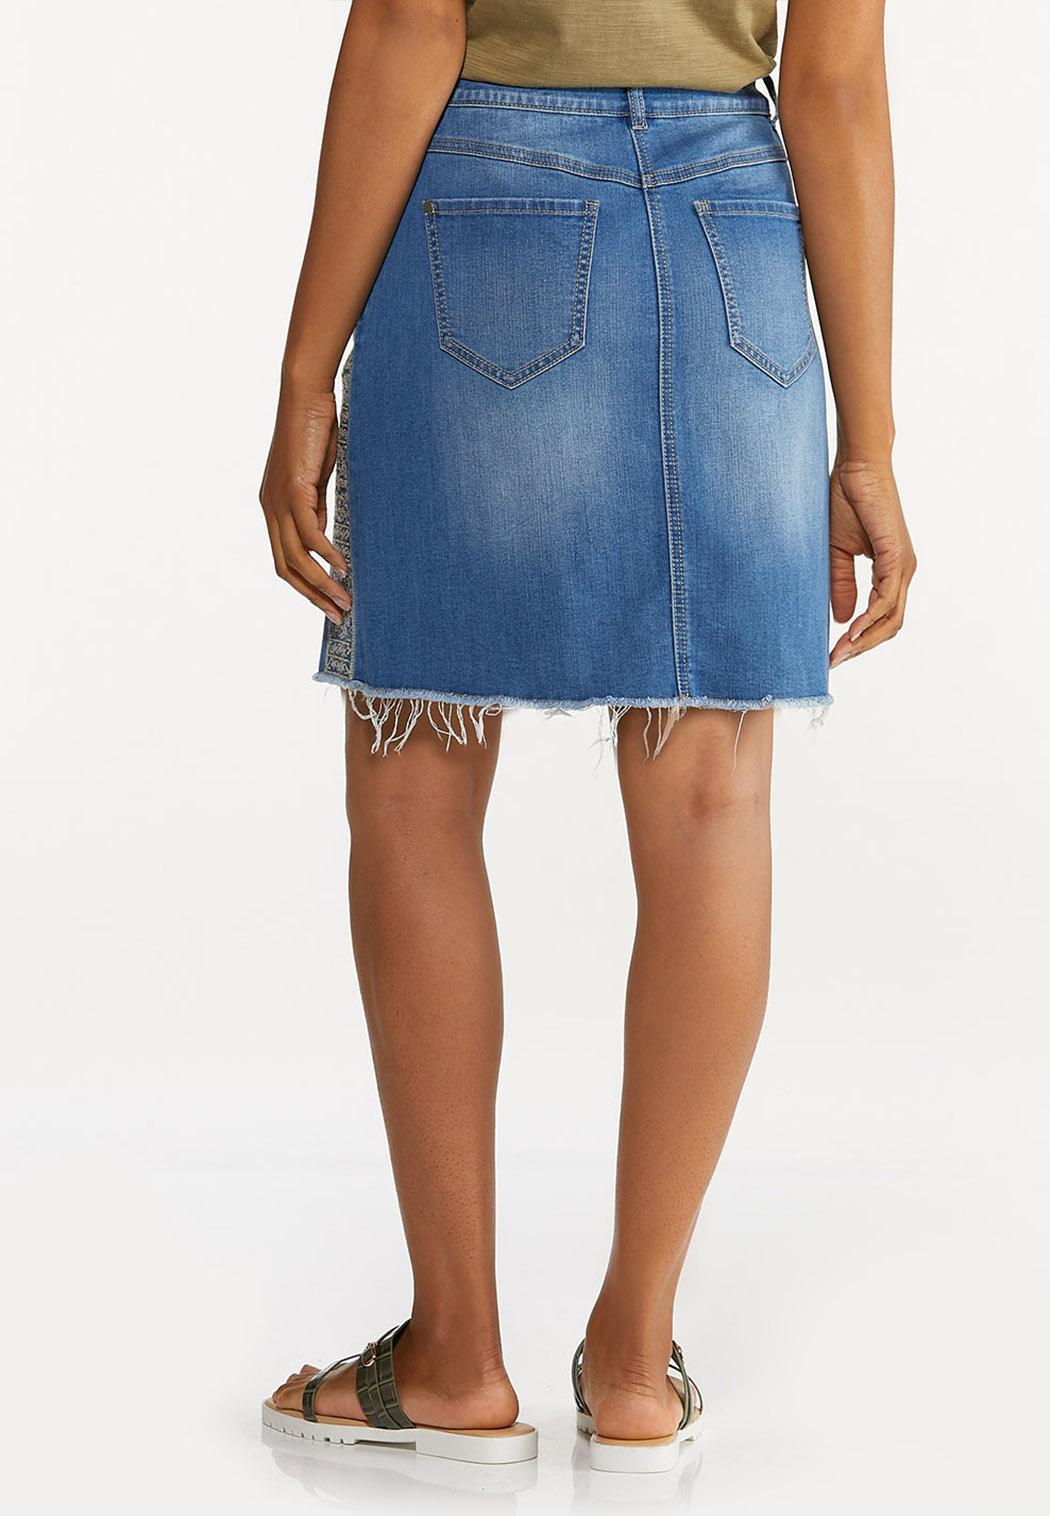 Plus Size Embroidered Denim Skirt (Item #44627573)